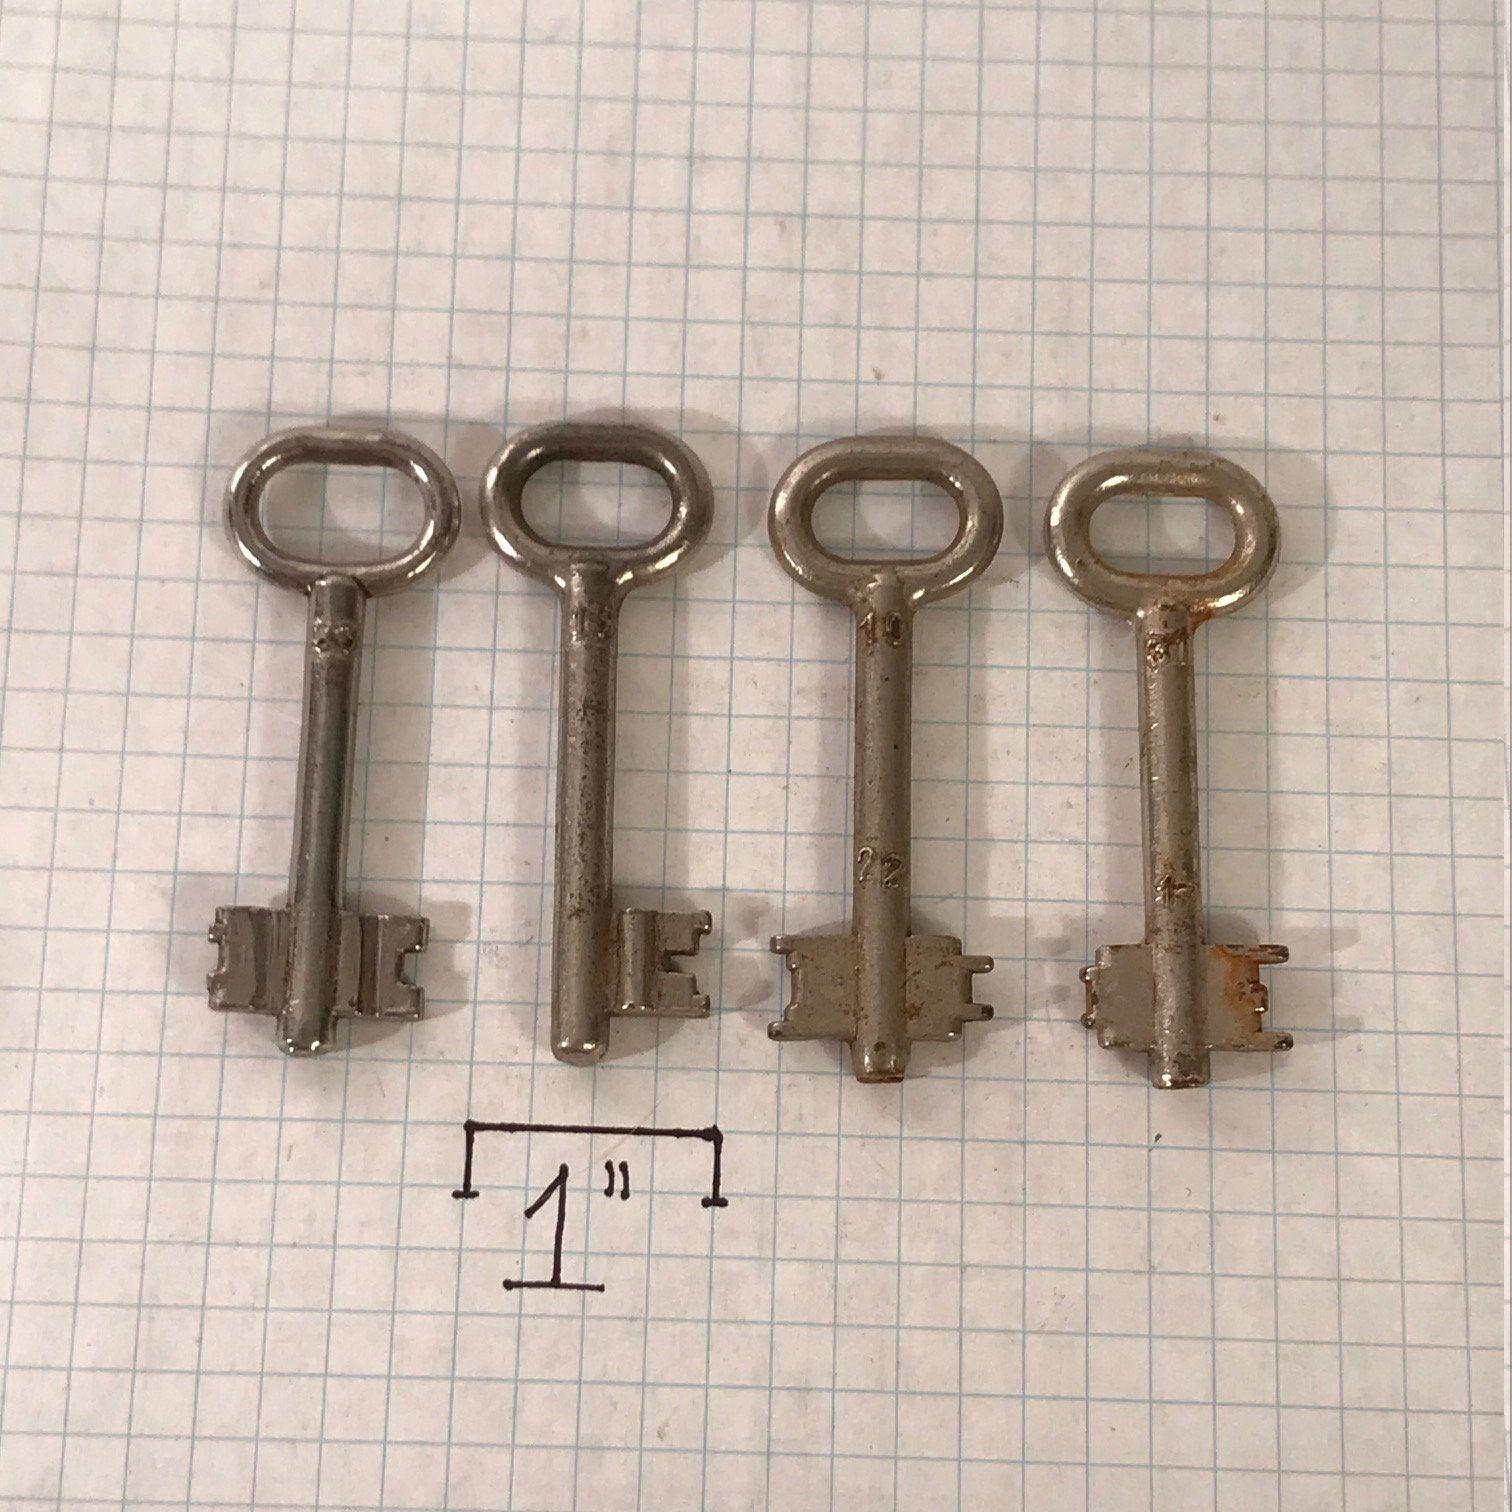 Vintage Skeleton Keys (lot of 4), Antique Metal Skeleton Keys, Russian Federation Keys, Maker Supplies, Steampunk Supply